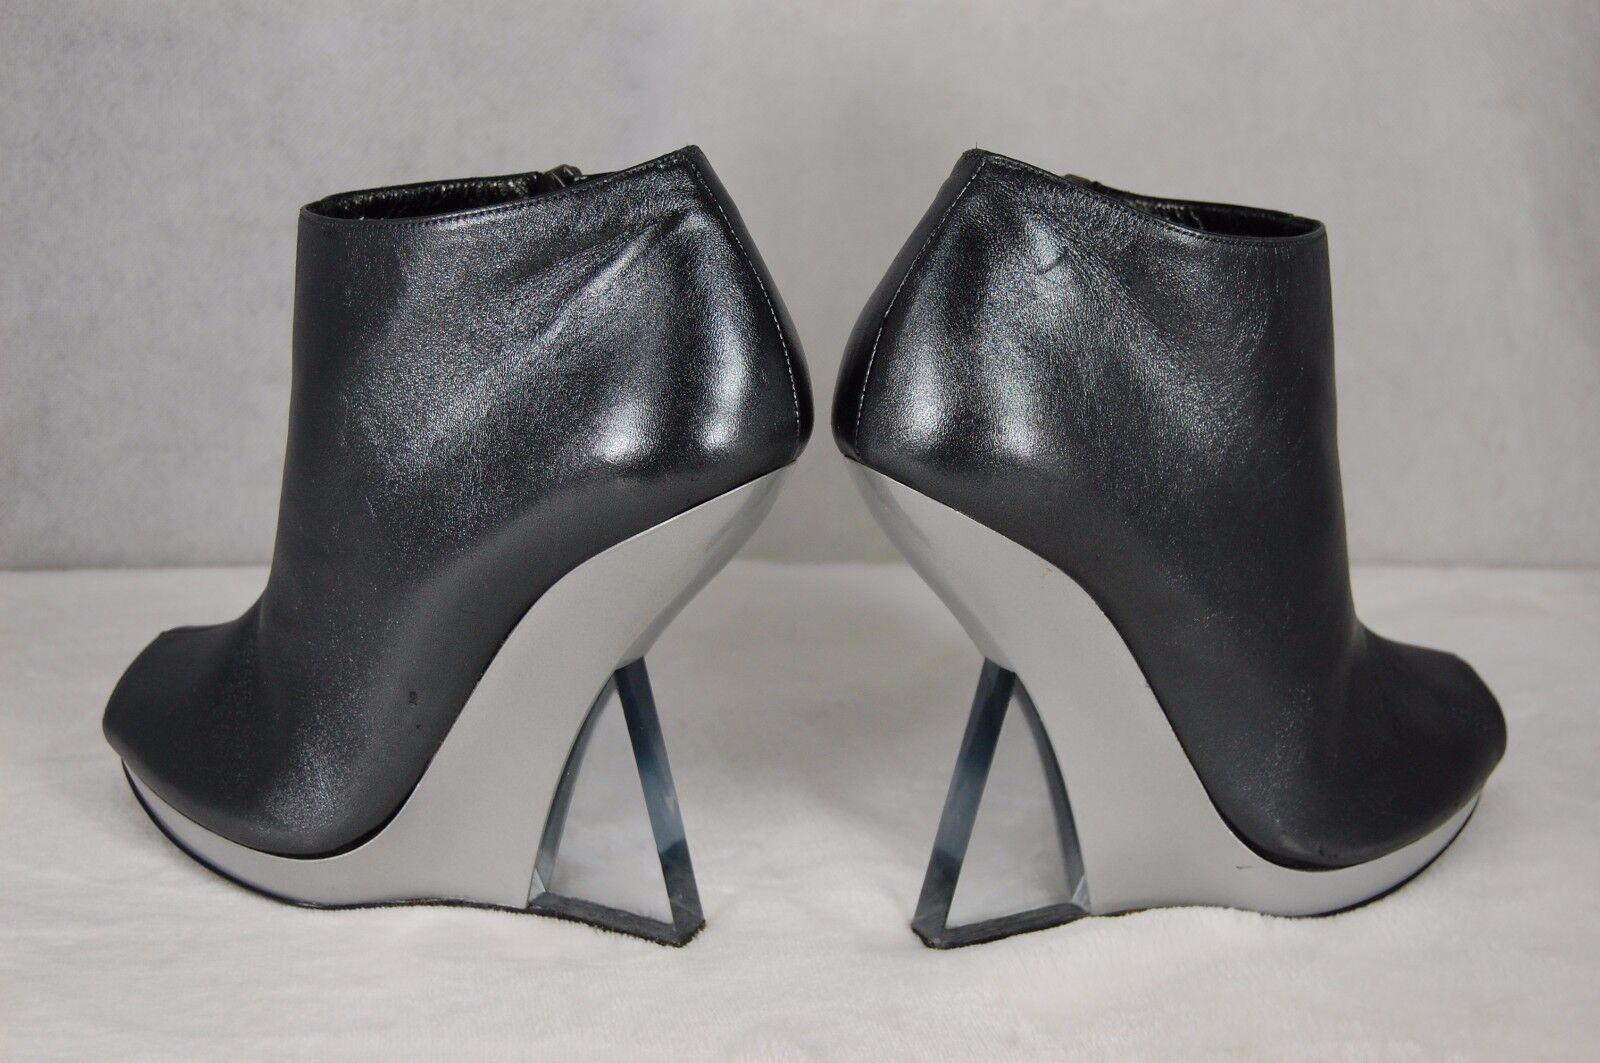 Salvatore Ferragamo Plexi Wedge Heels Metallic Leather Lucite femmes bottes 7.5